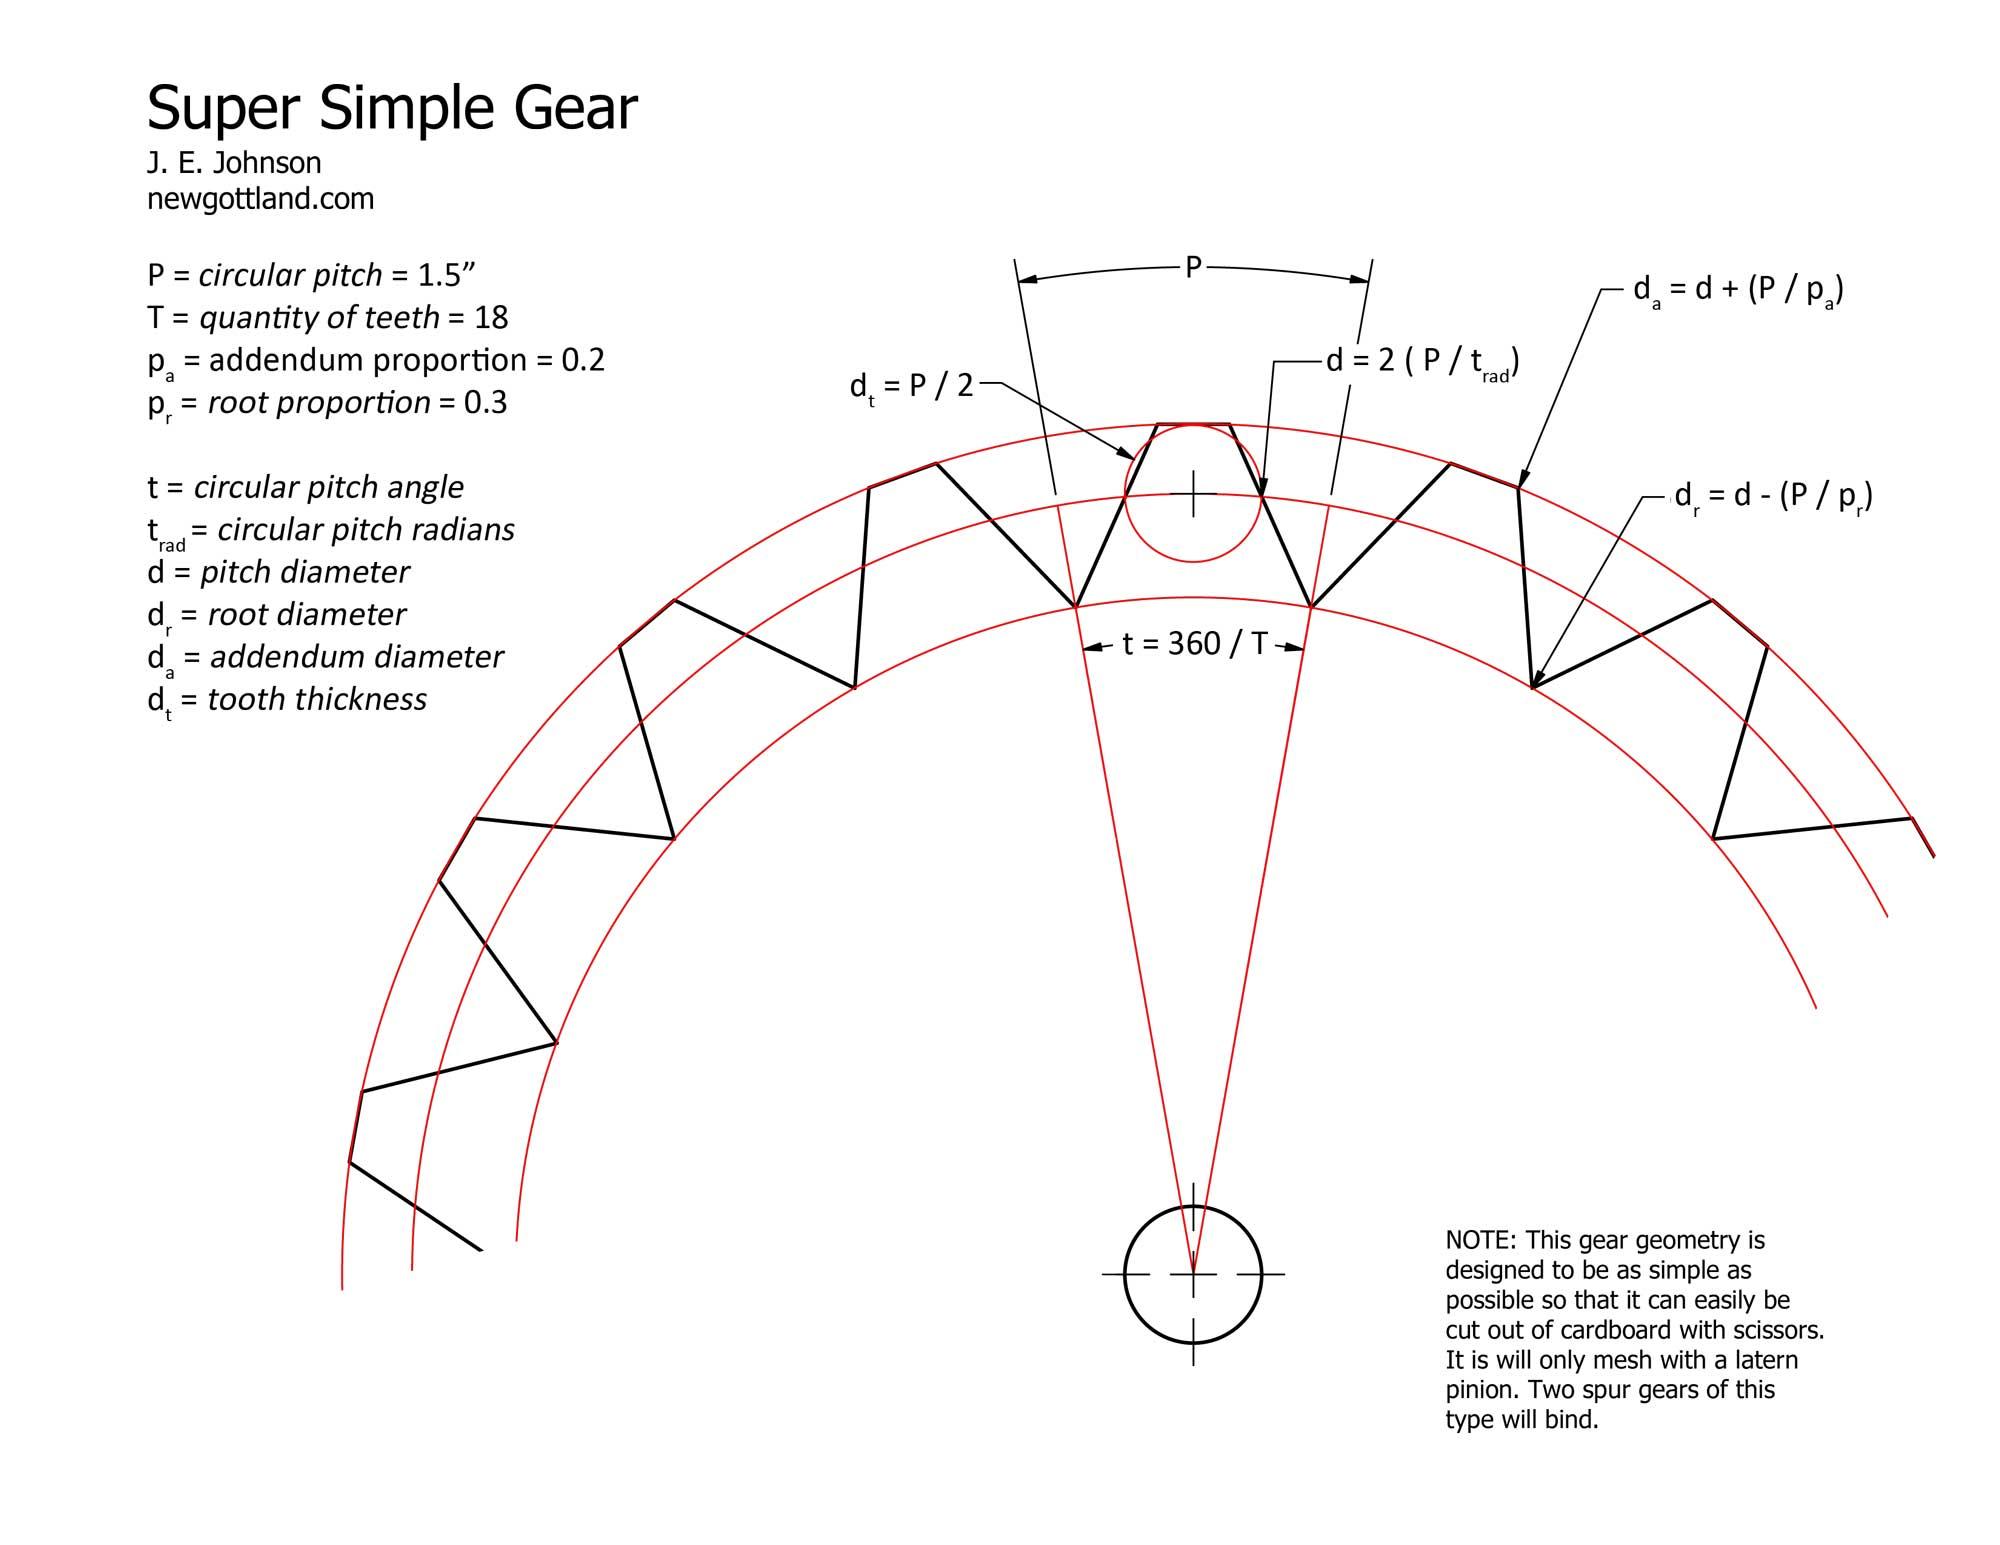 tattoo power supply wiring diagram ingersoll rand club car machine related keywords